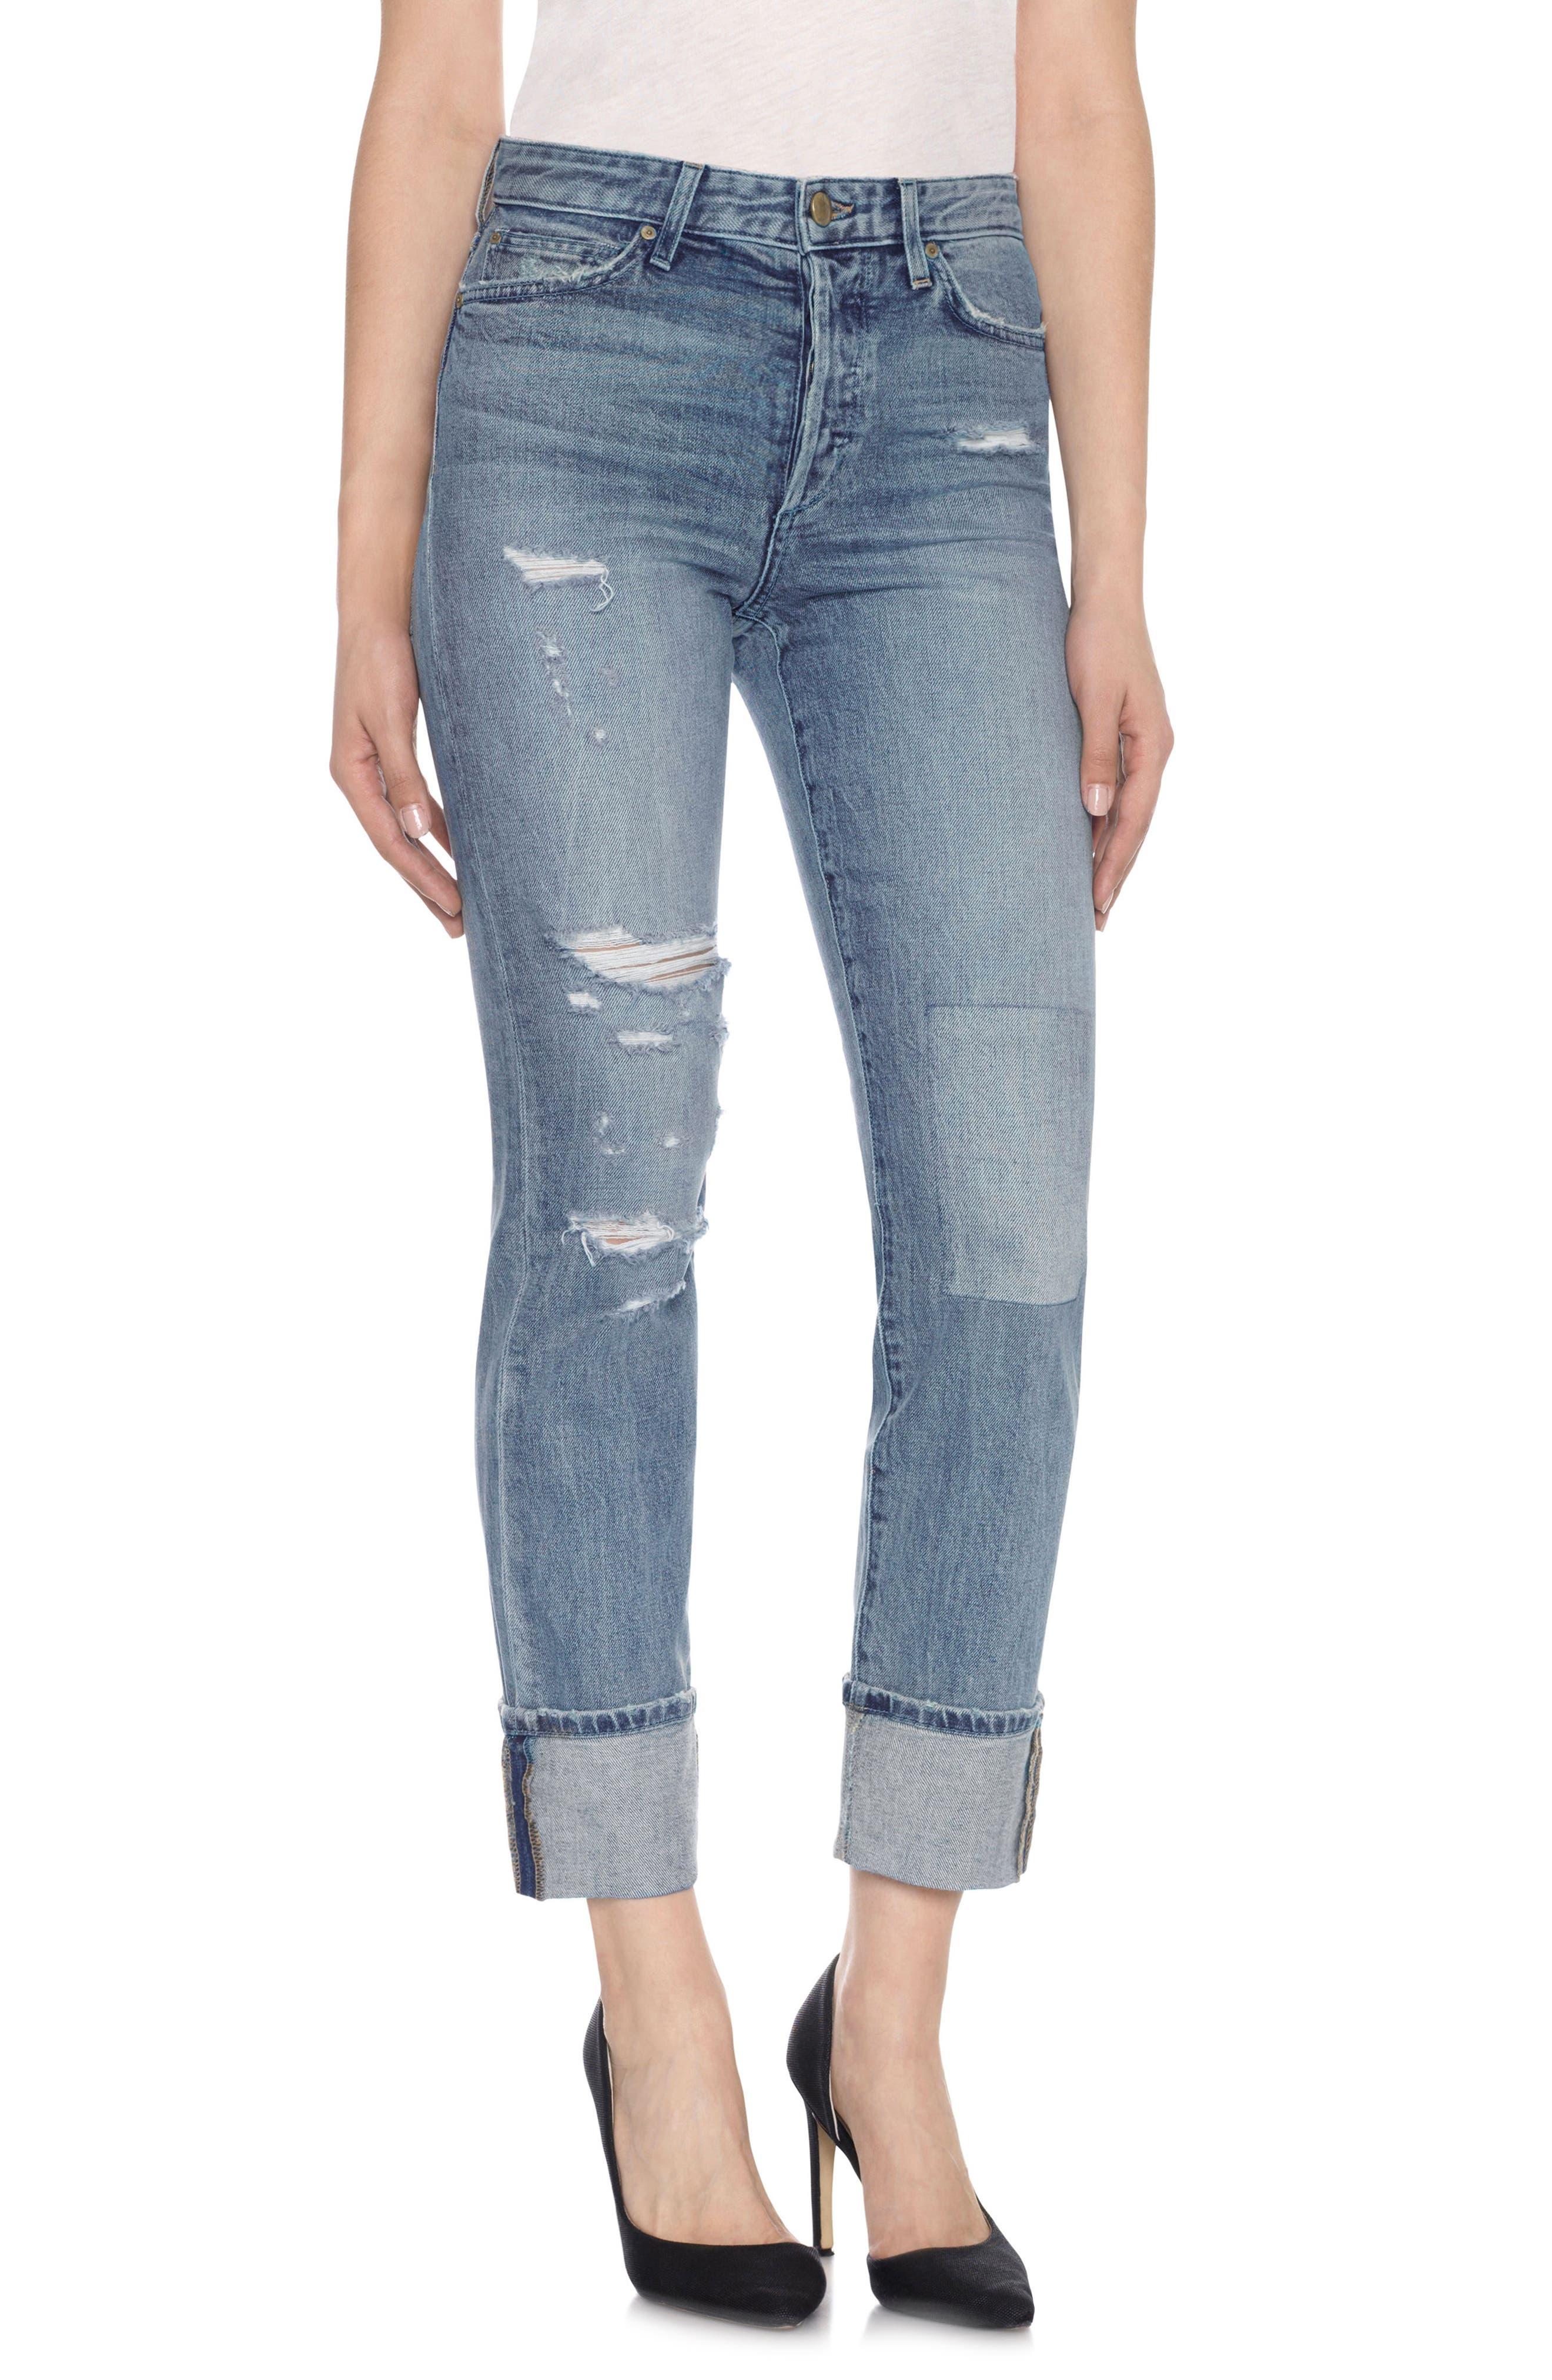 Main Image - Taylor Hill x Joe's Debbie Cuff Straight Leg Jeans (Jaylee)